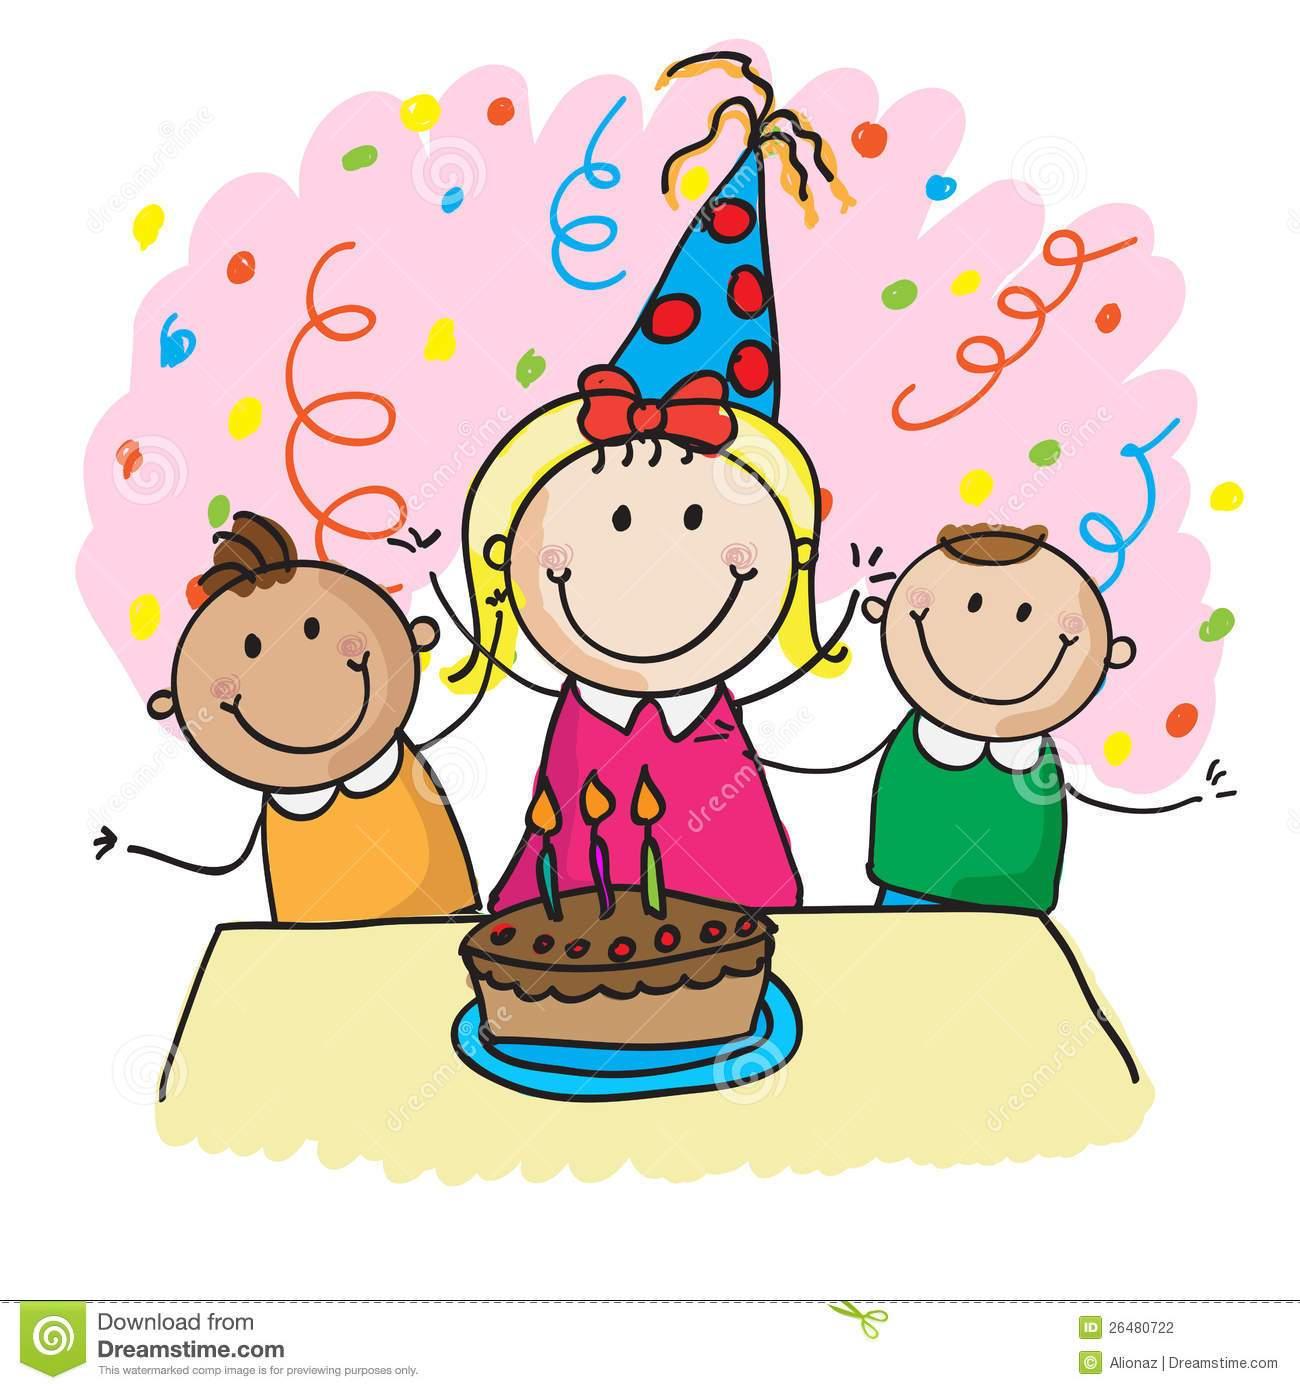 Kids birthday clipart free svg transparent download Kids birthday clipart free 3 » Clipart Portal svg transparent download